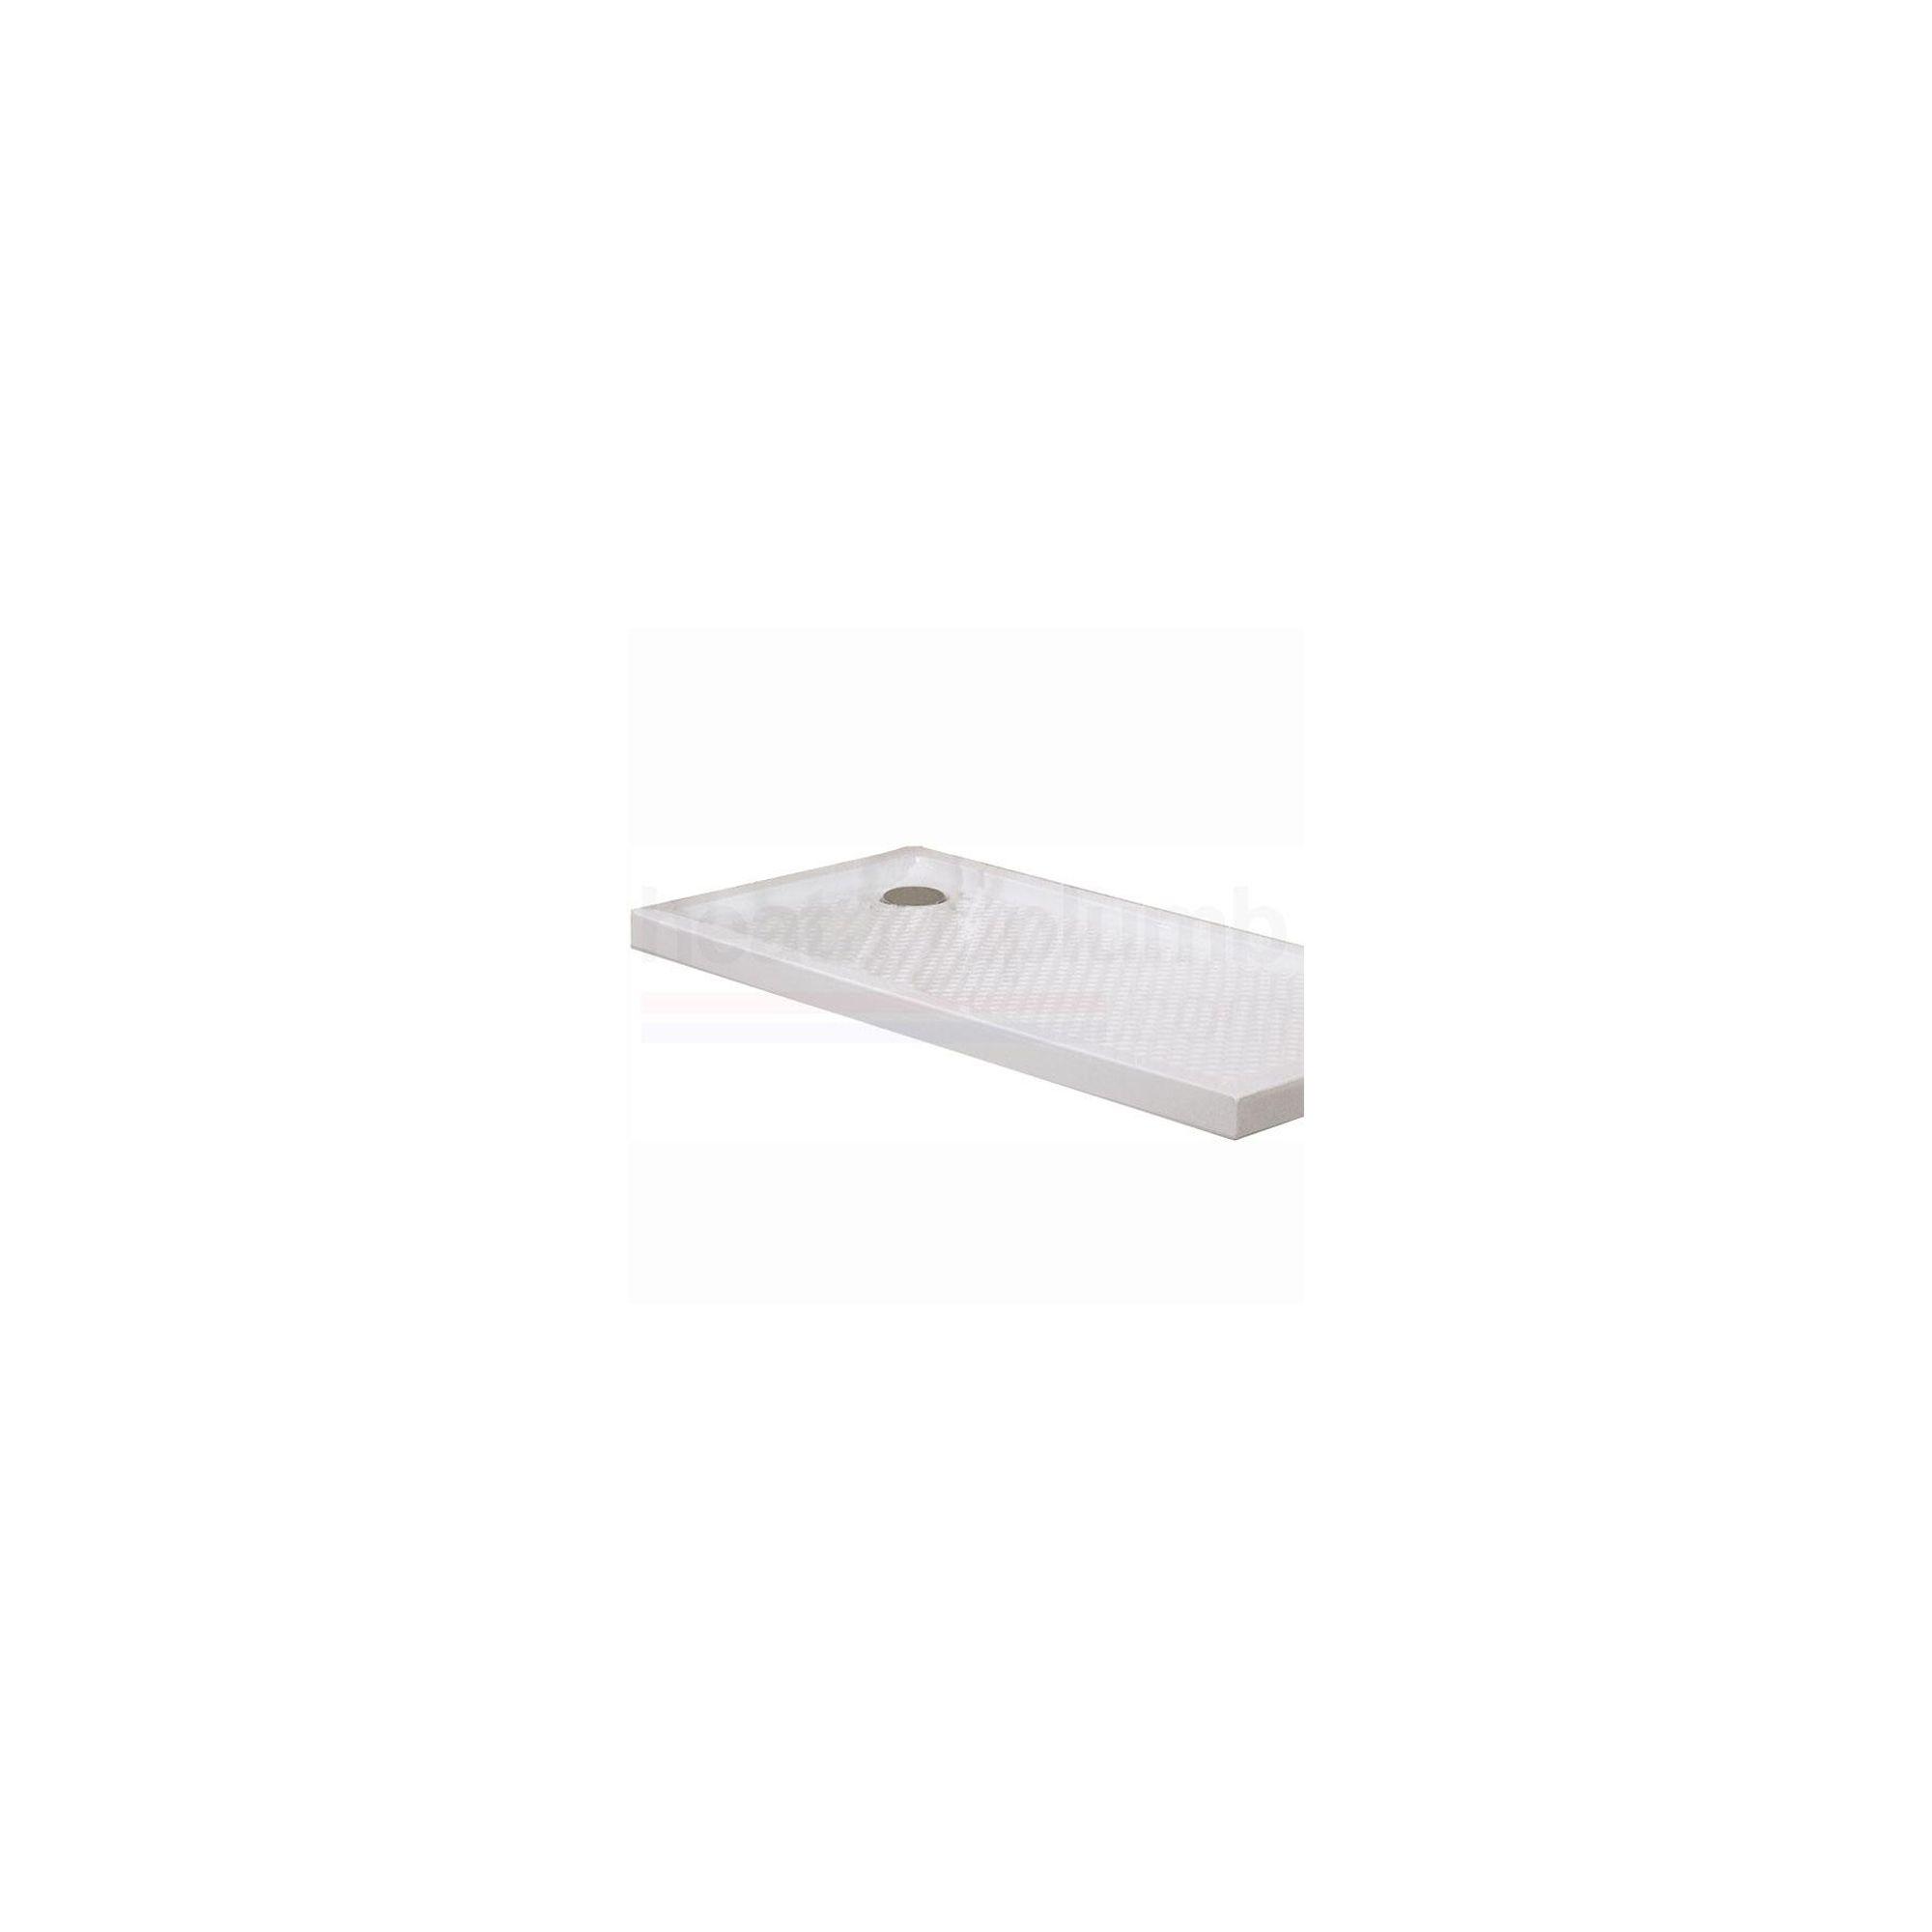 AKW Keppel Rectangular Shower Tray 1200mm x 700mm at Tesco Direct